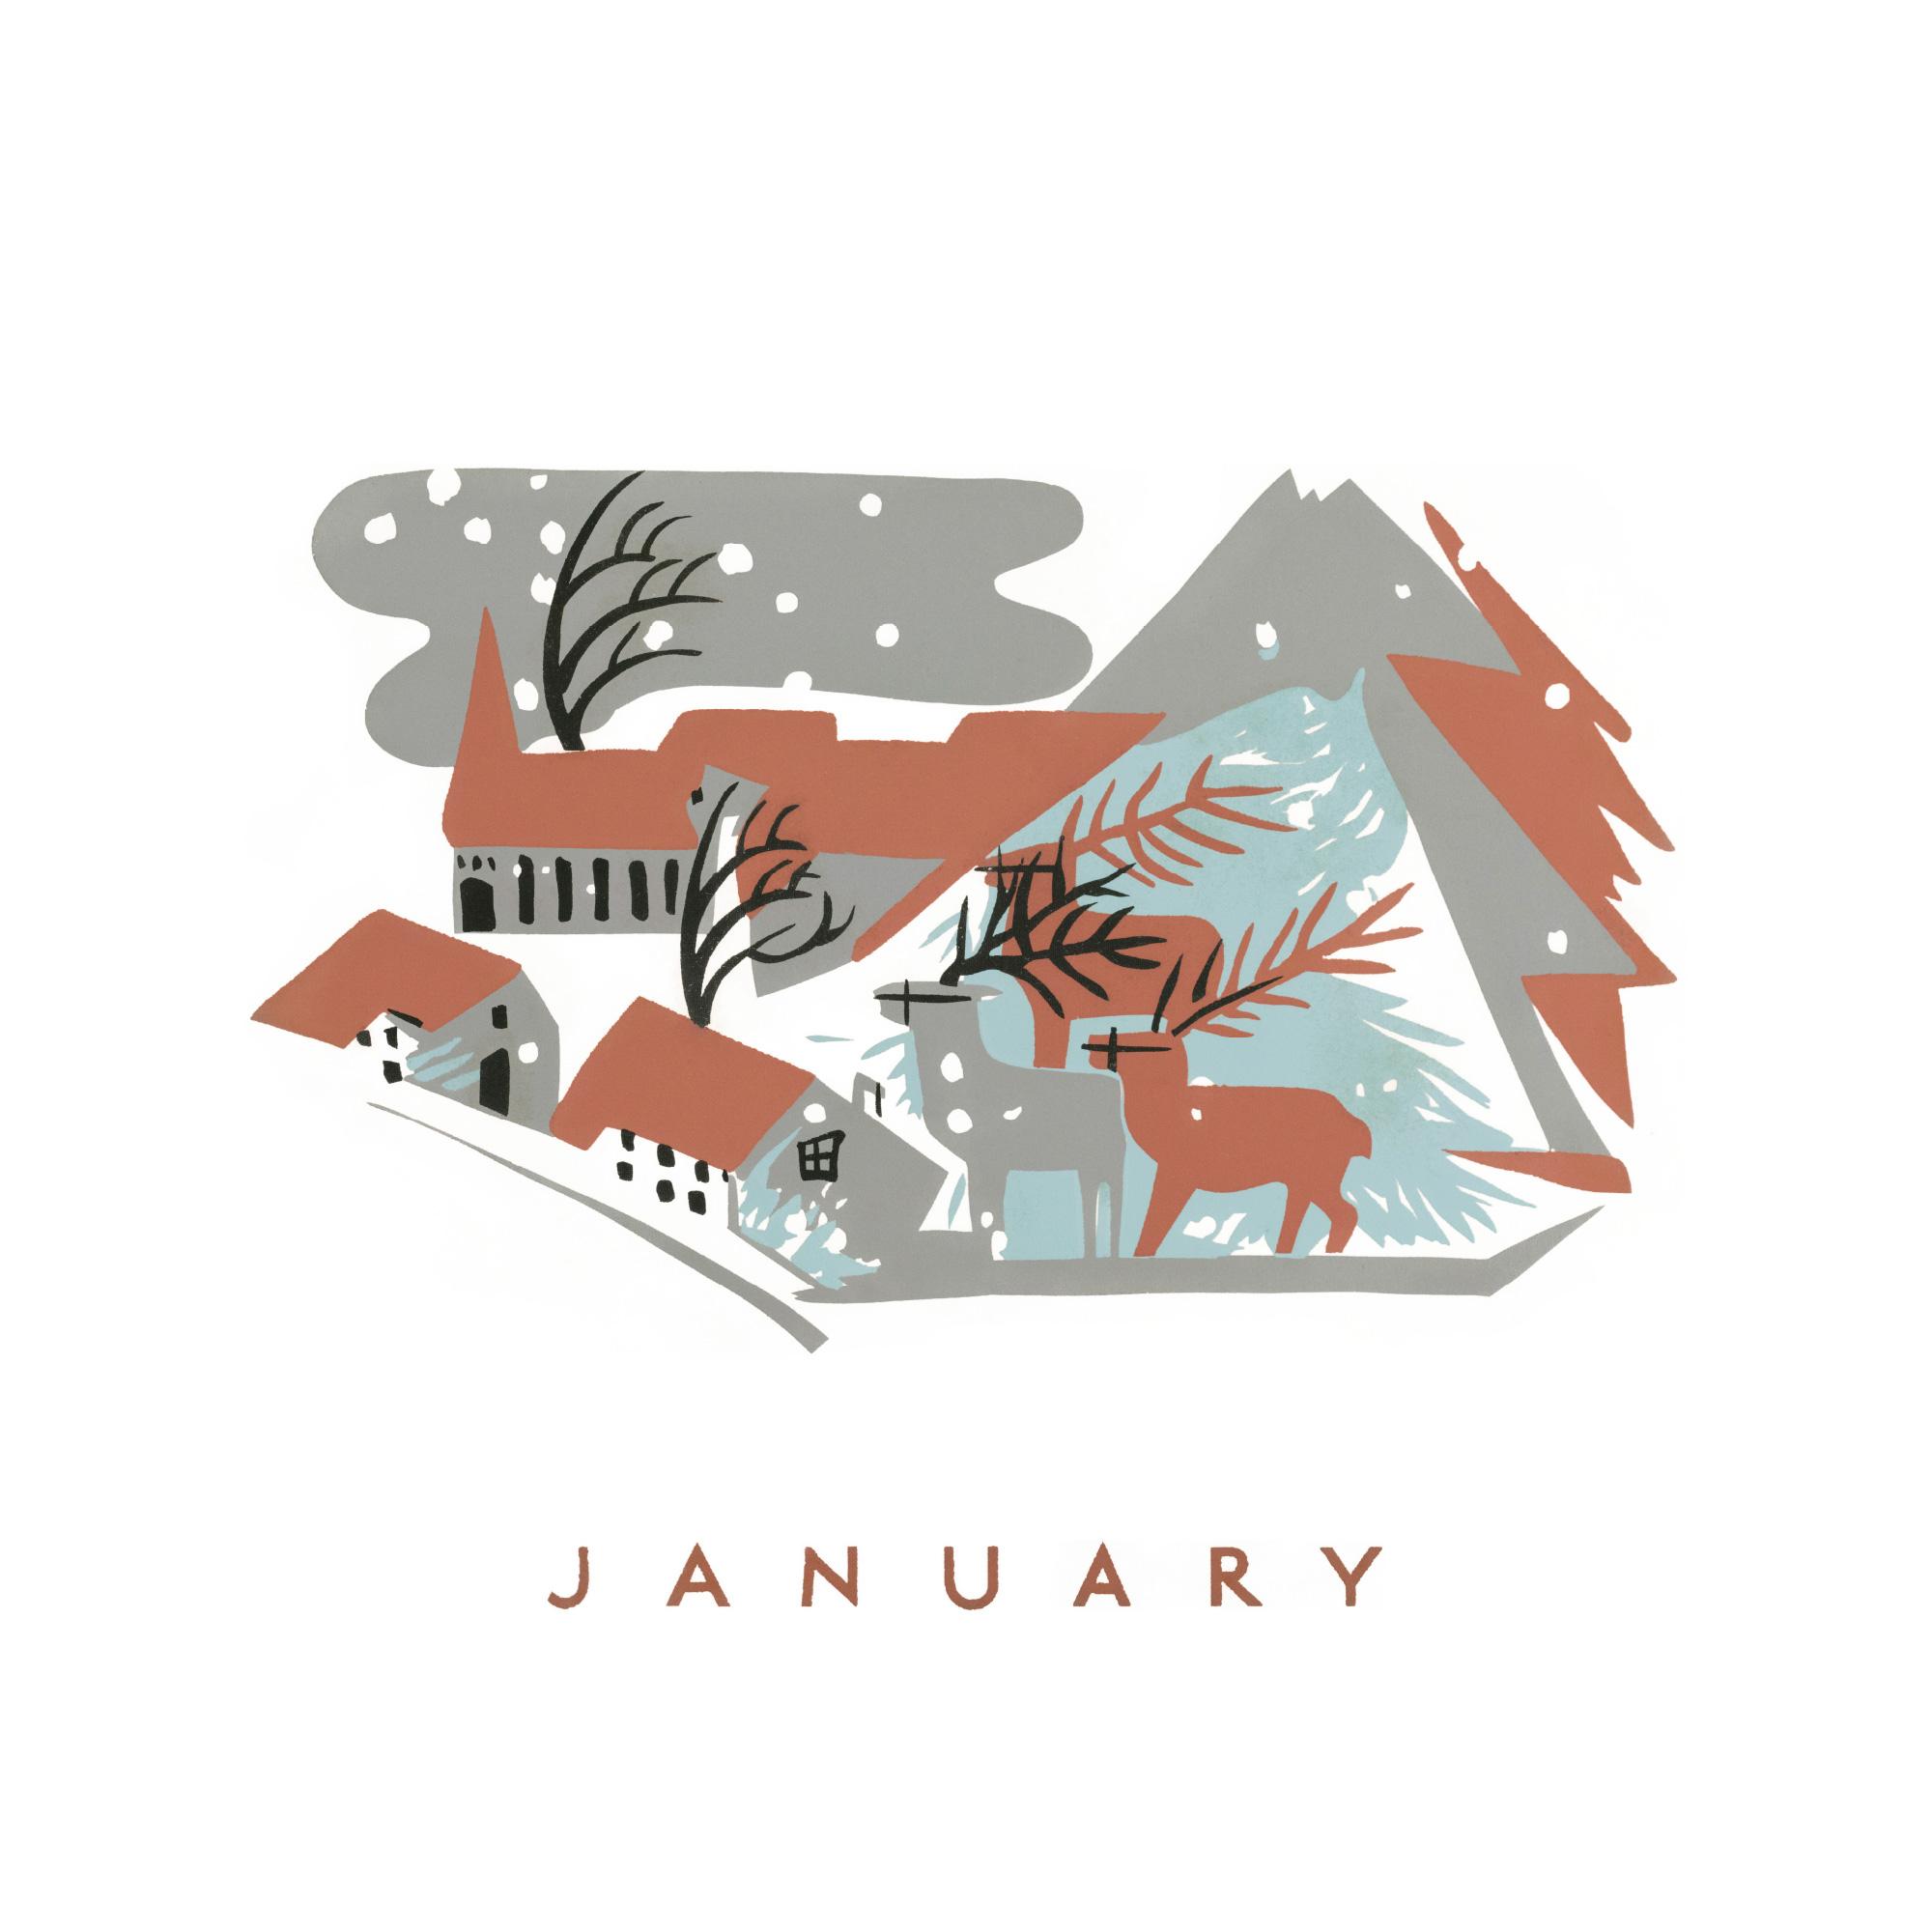 01 January.jpg